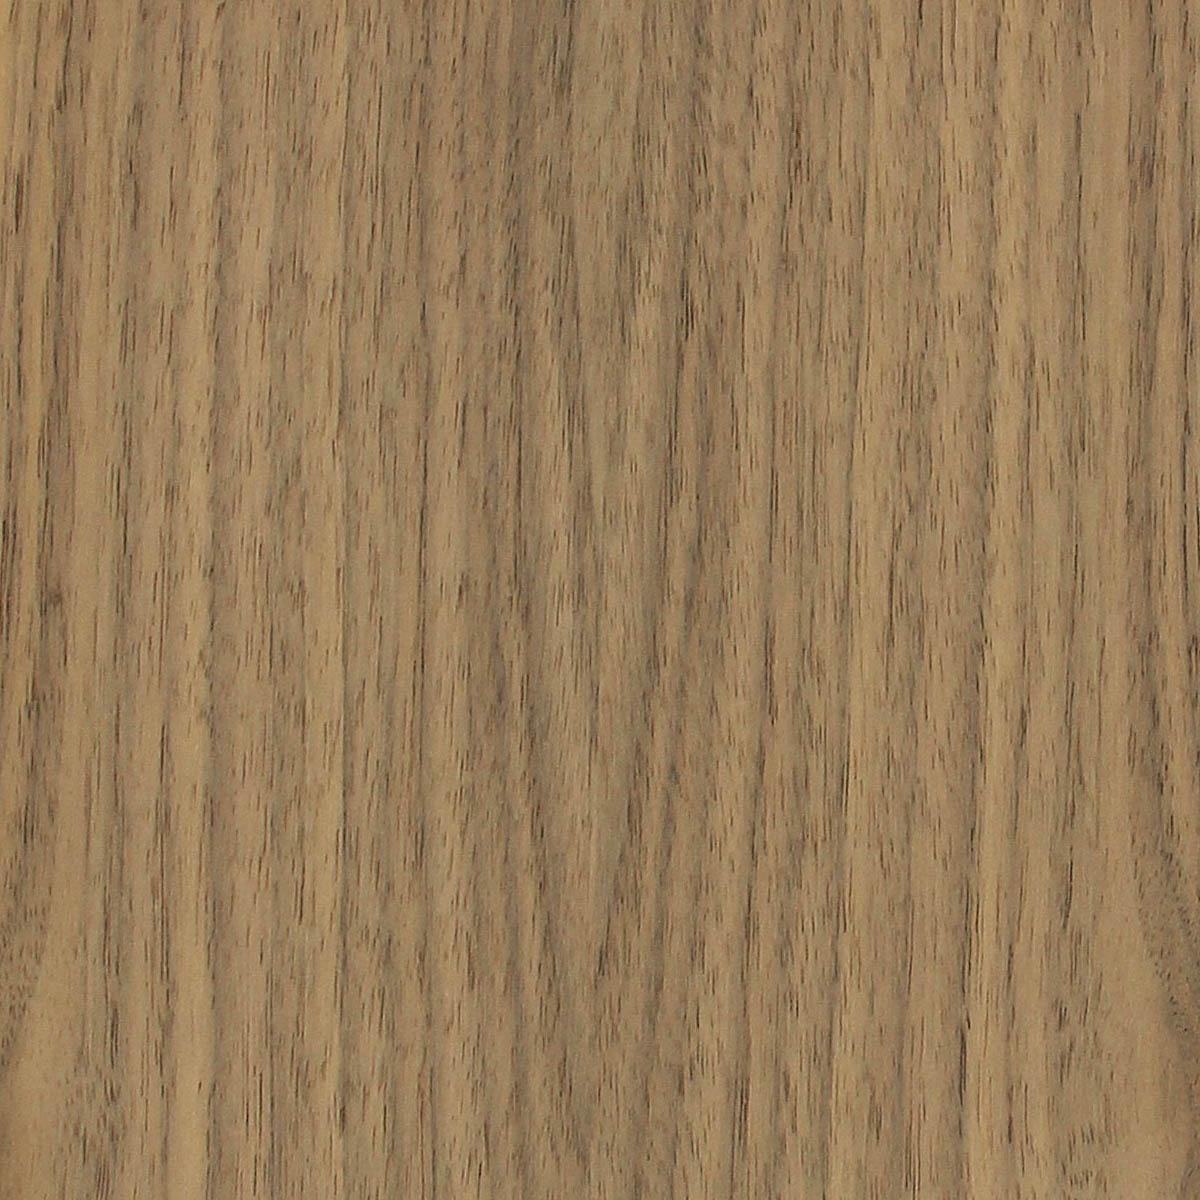 Walnut Quarter Cut Paper Back Veneer Sheet 4 X 8 Roll